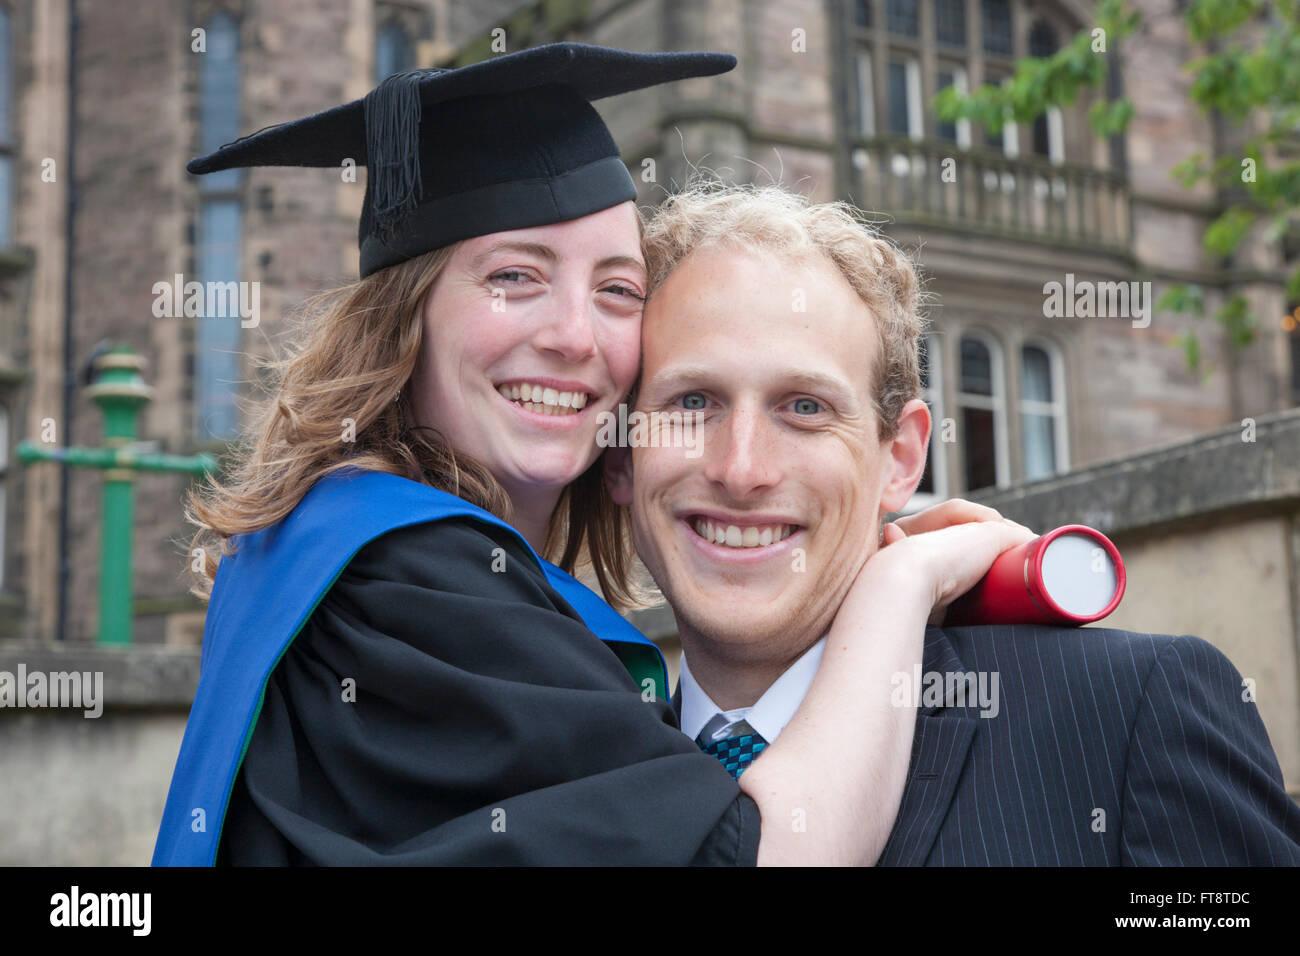 Edinburgh, City of Edinburgh, Scotland. Young couple celebrating graduation from the University of Edinburgh. - Stock Image